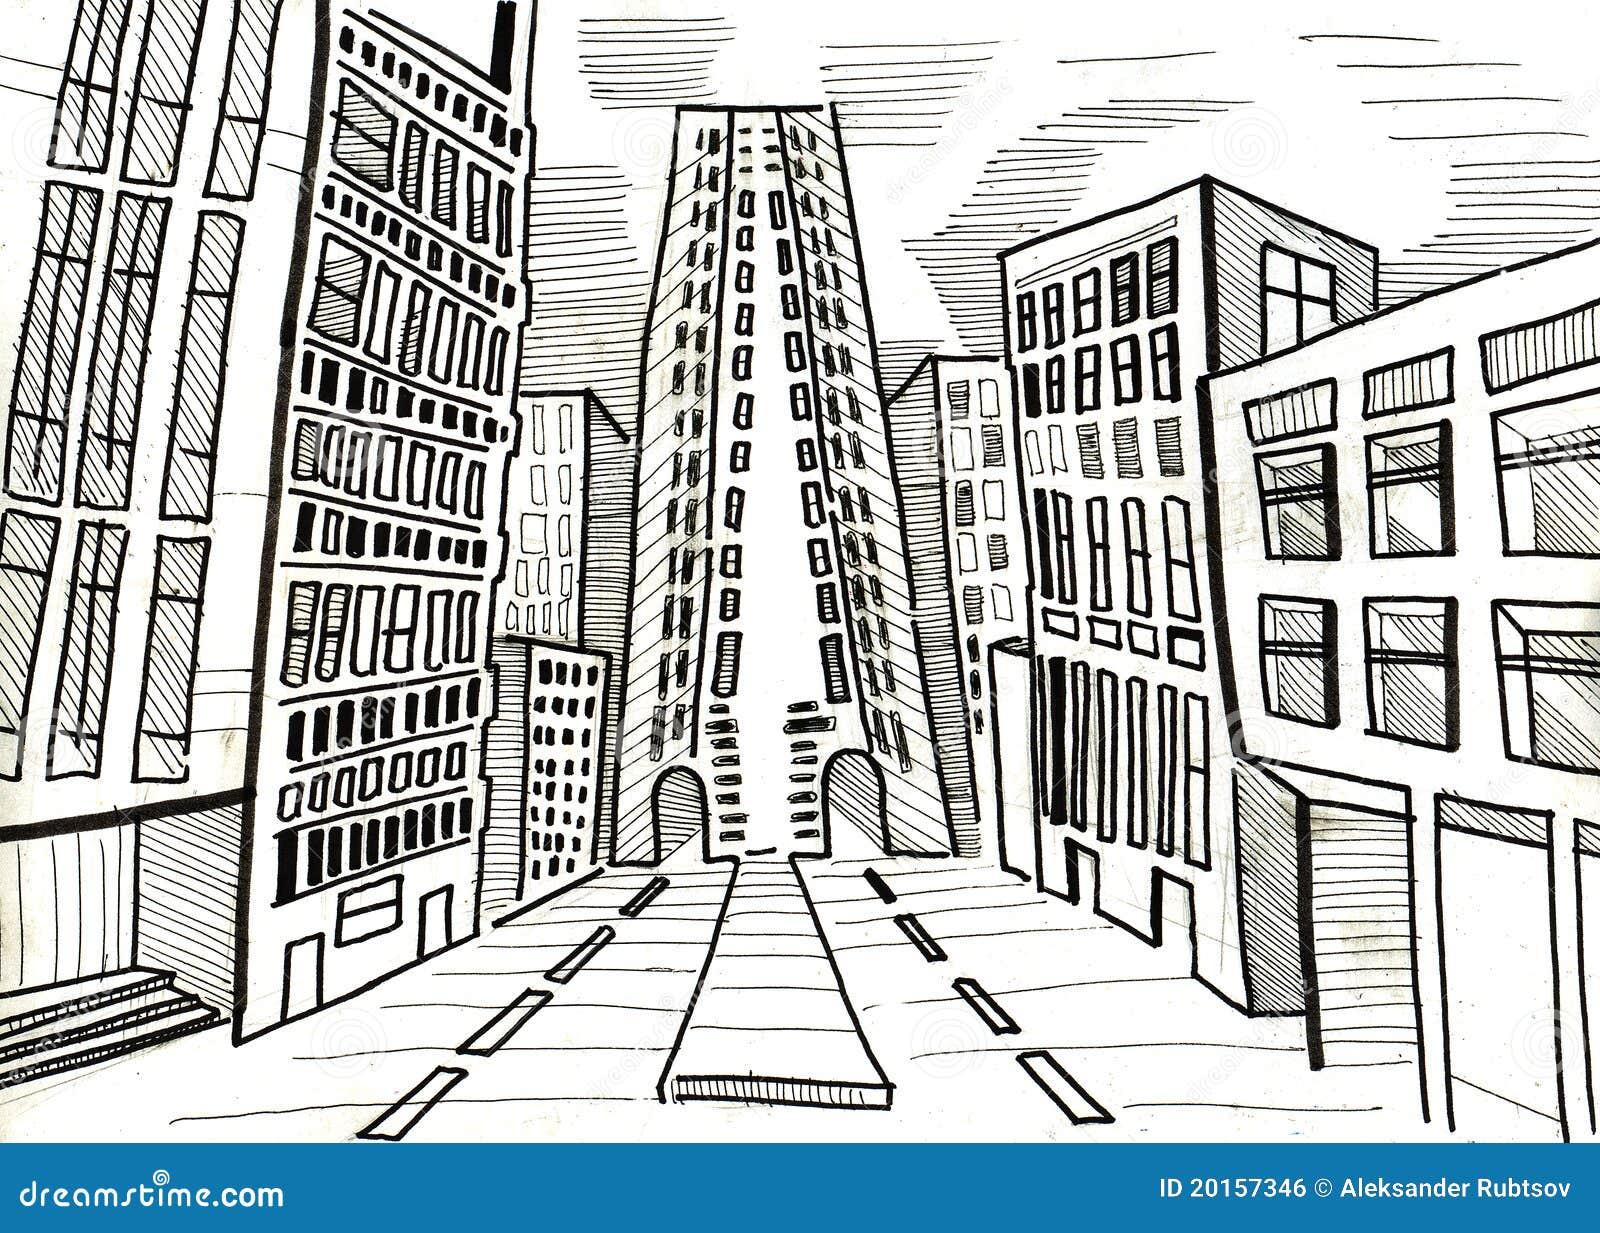 Trendy stad en koepel en tekening en with tekenen architect for Trap tekenen plattegrond